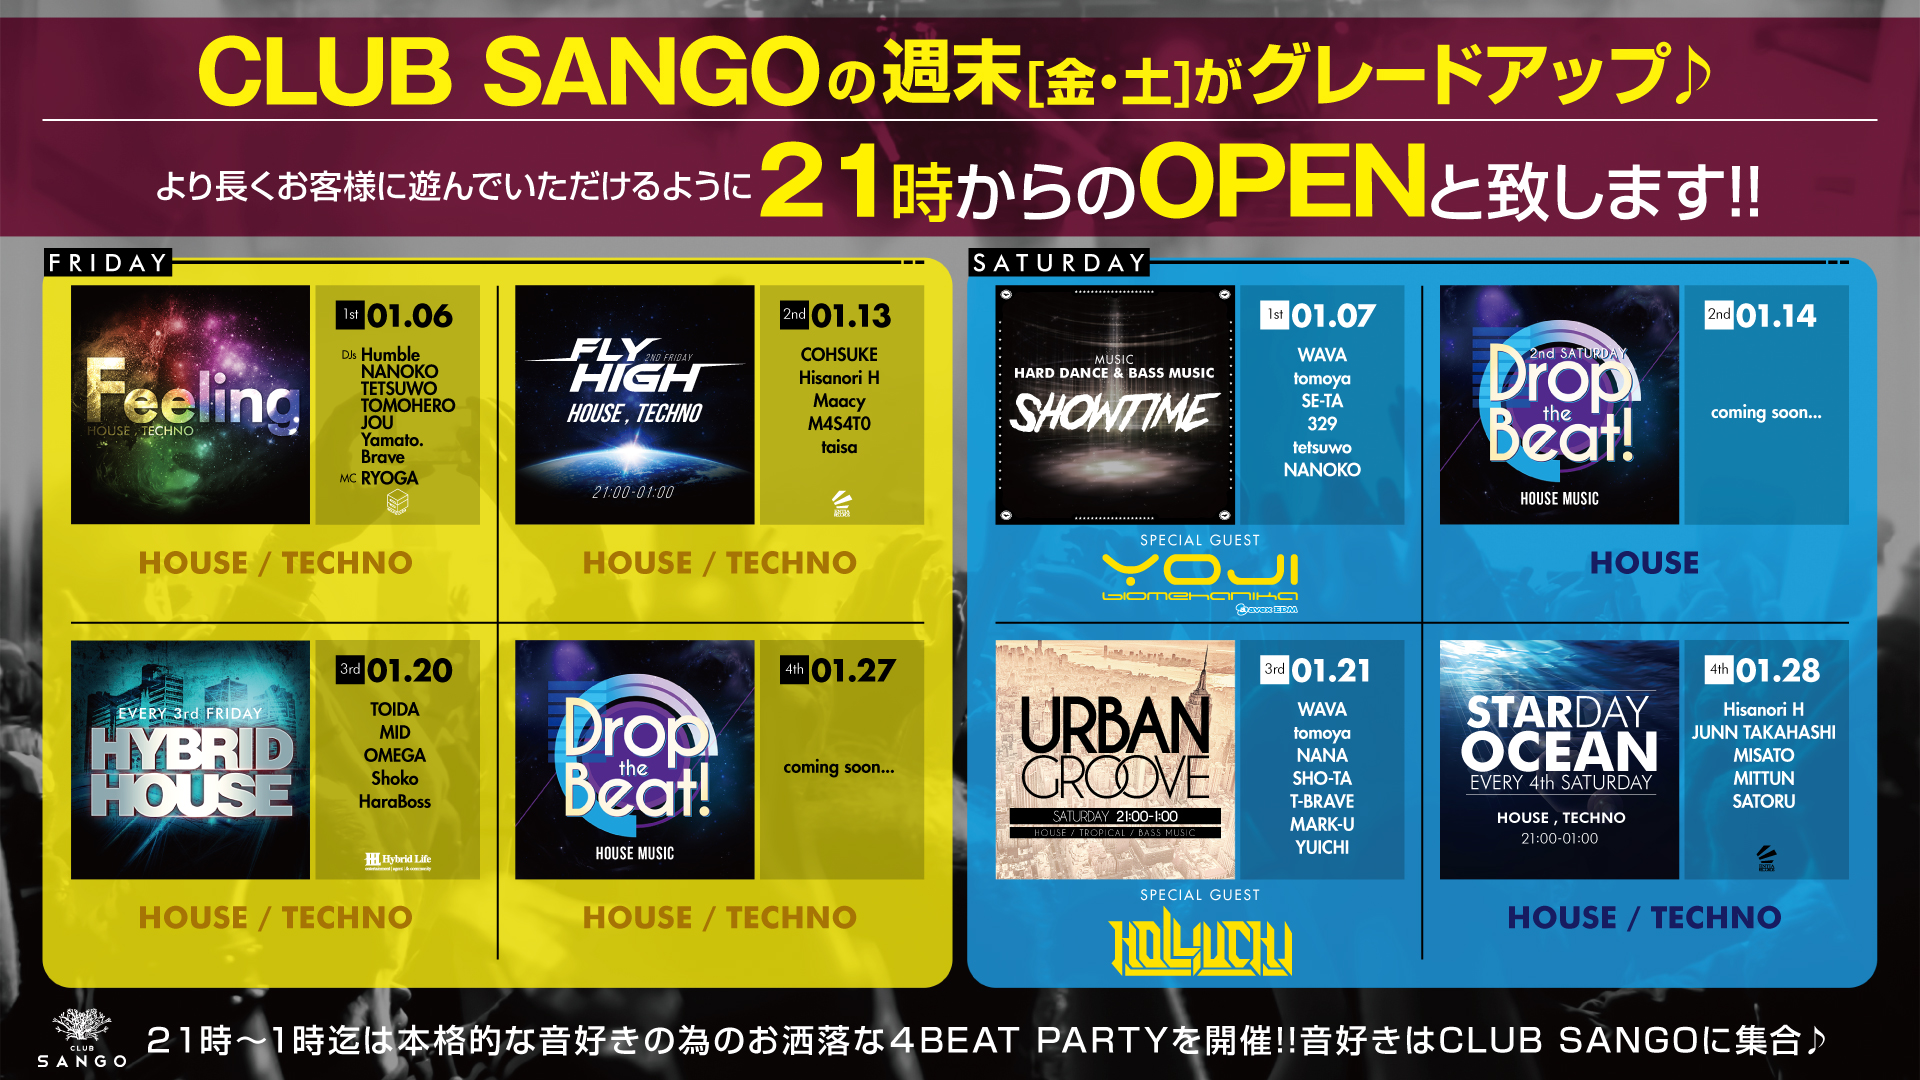 CLUB SANGOの週末[金・土]がグレードアップ!!